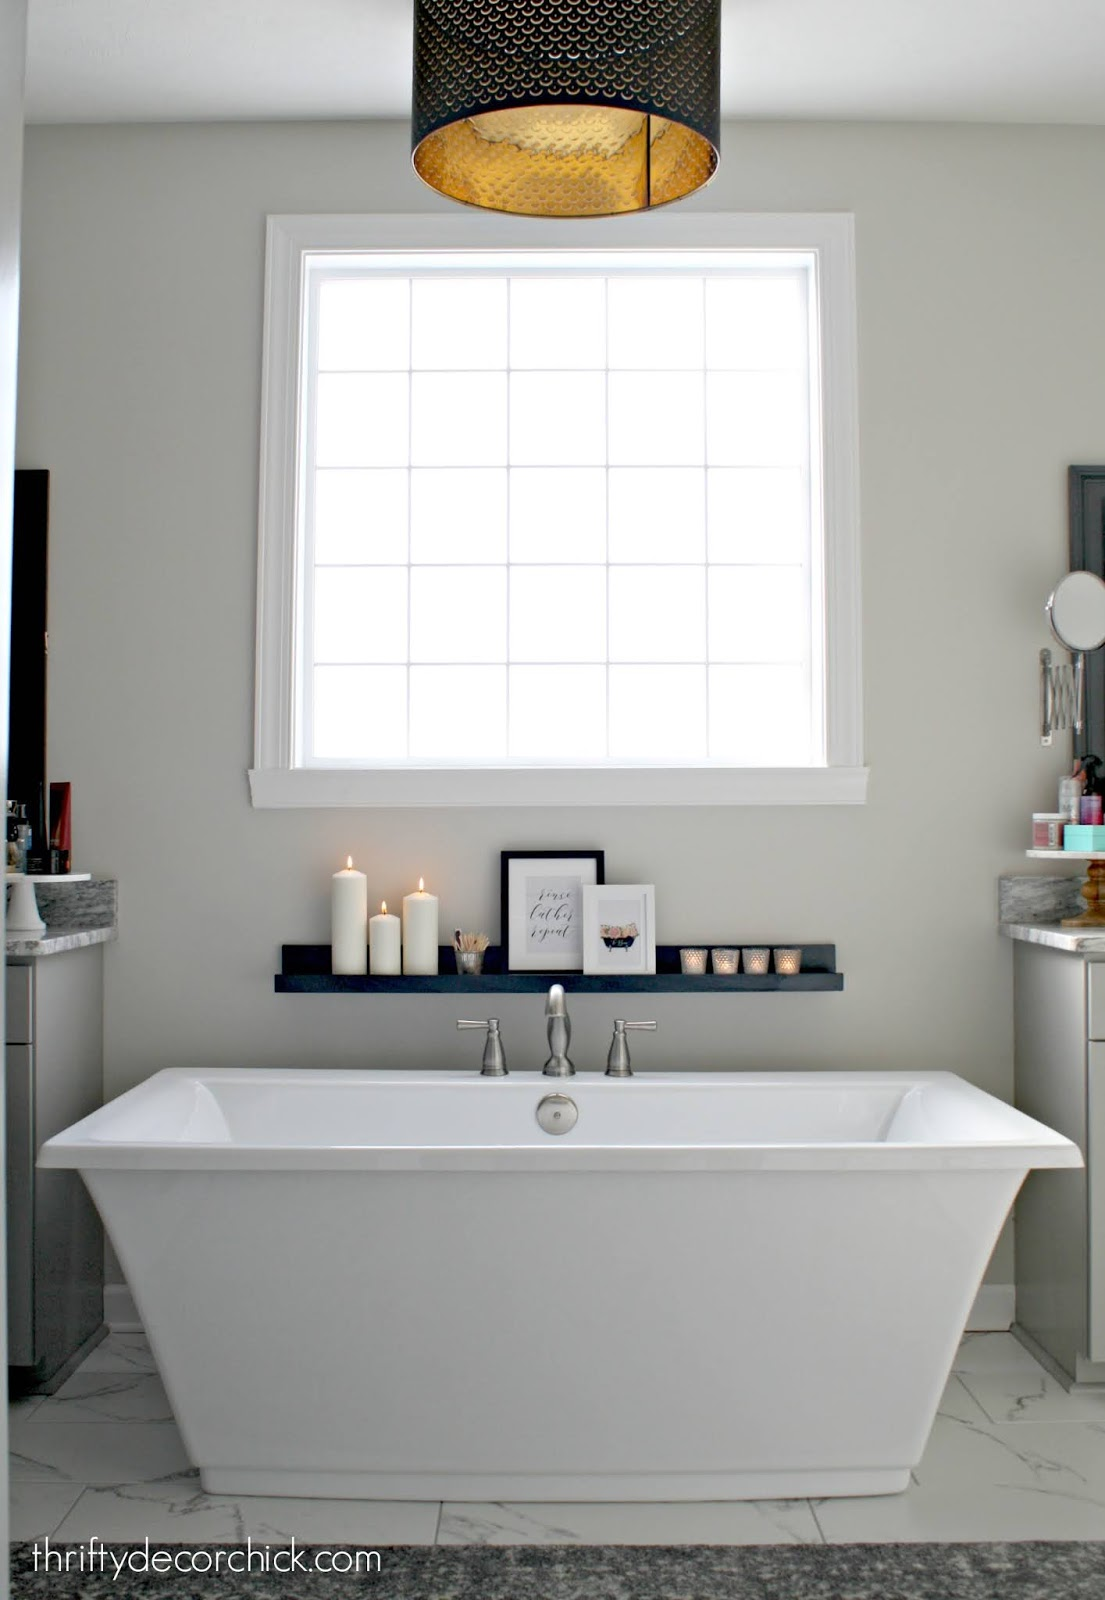 wood spa ledge by tub